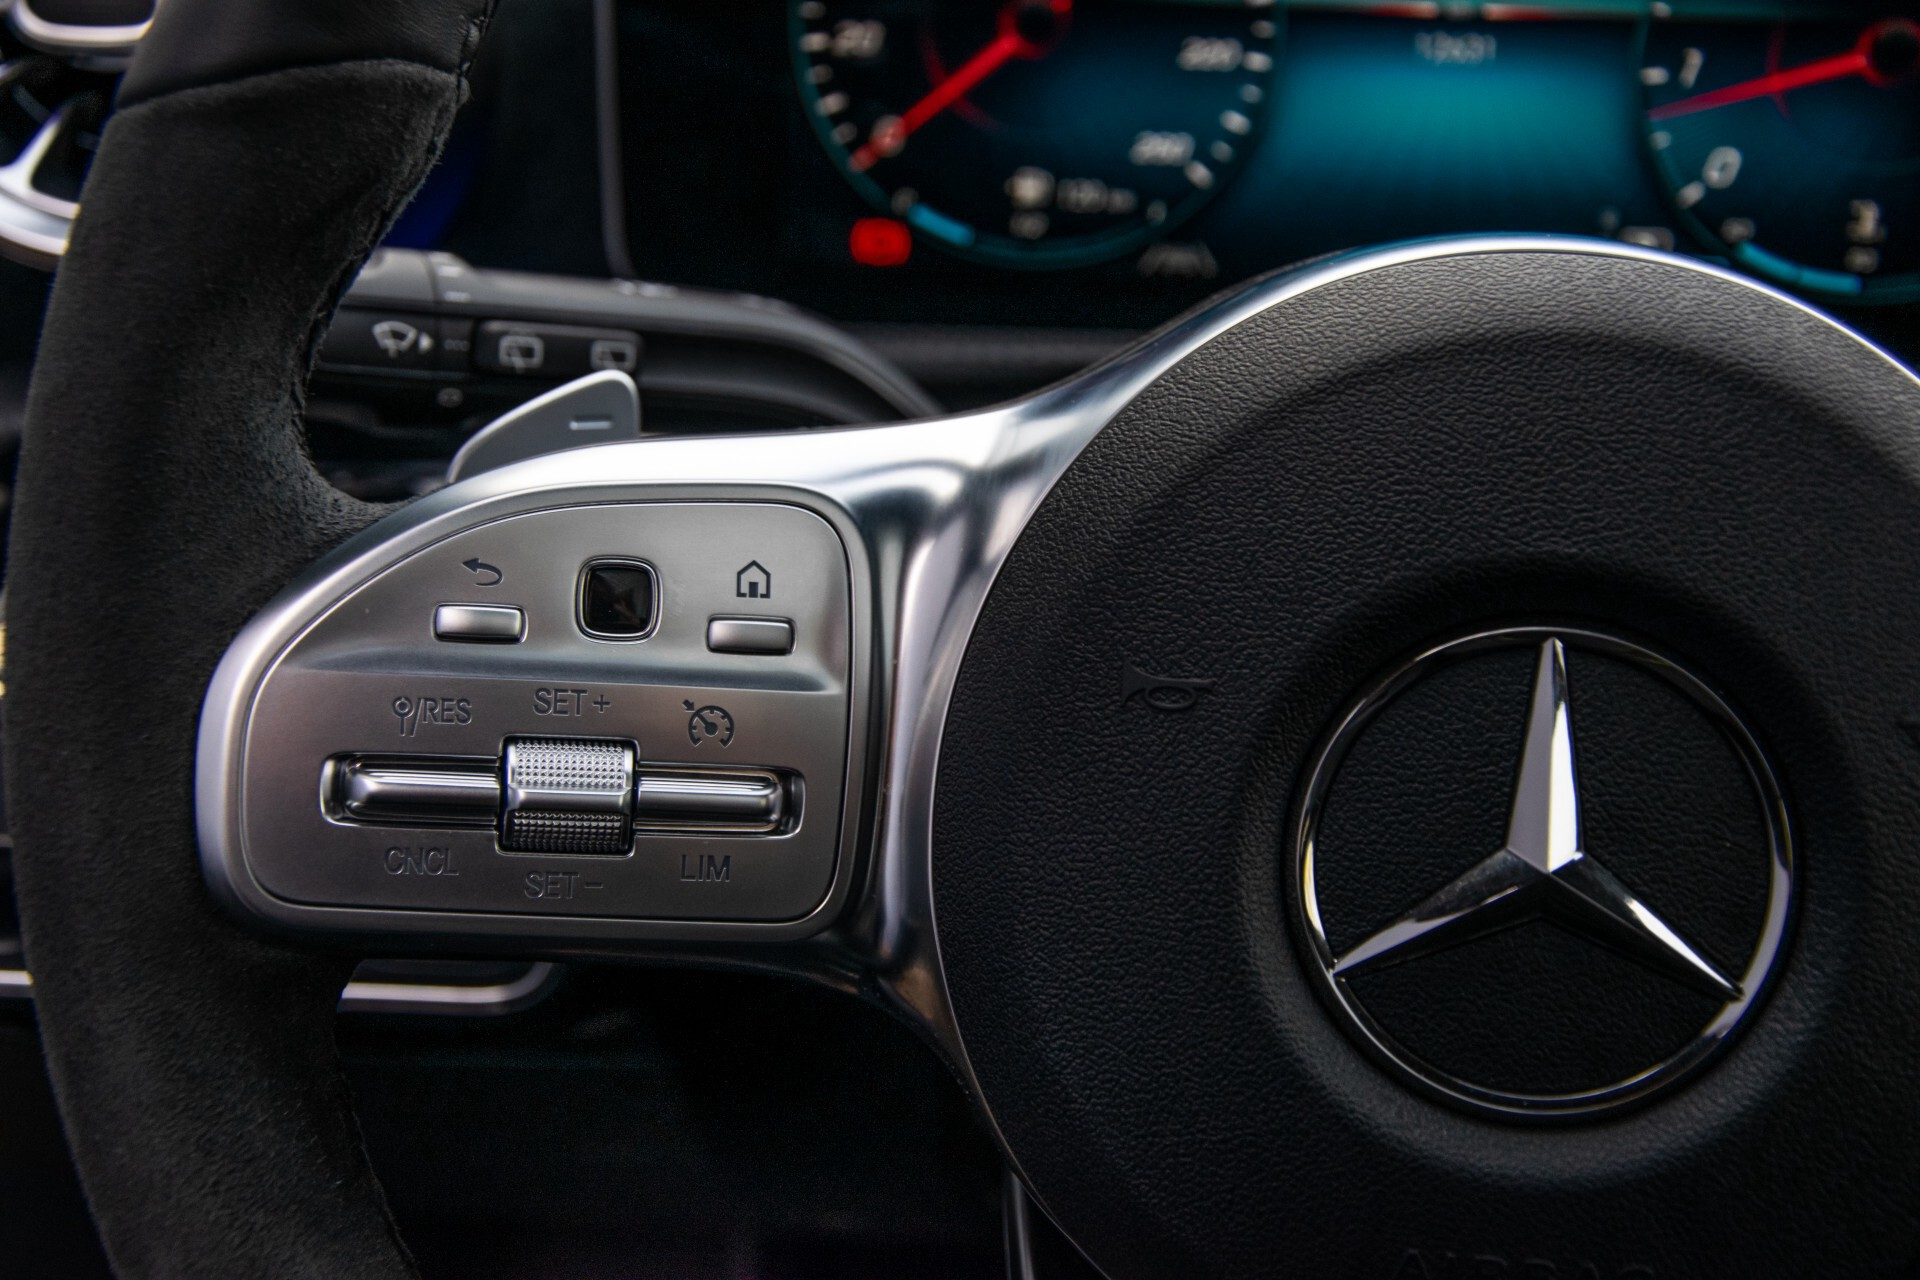 Mercedes-Benz A-Klasse 250 4-M AMG Panorama/Keyless-Entry/MBUX/HUD/Burmester/360/Multibeam LED Aut7 Foto 10